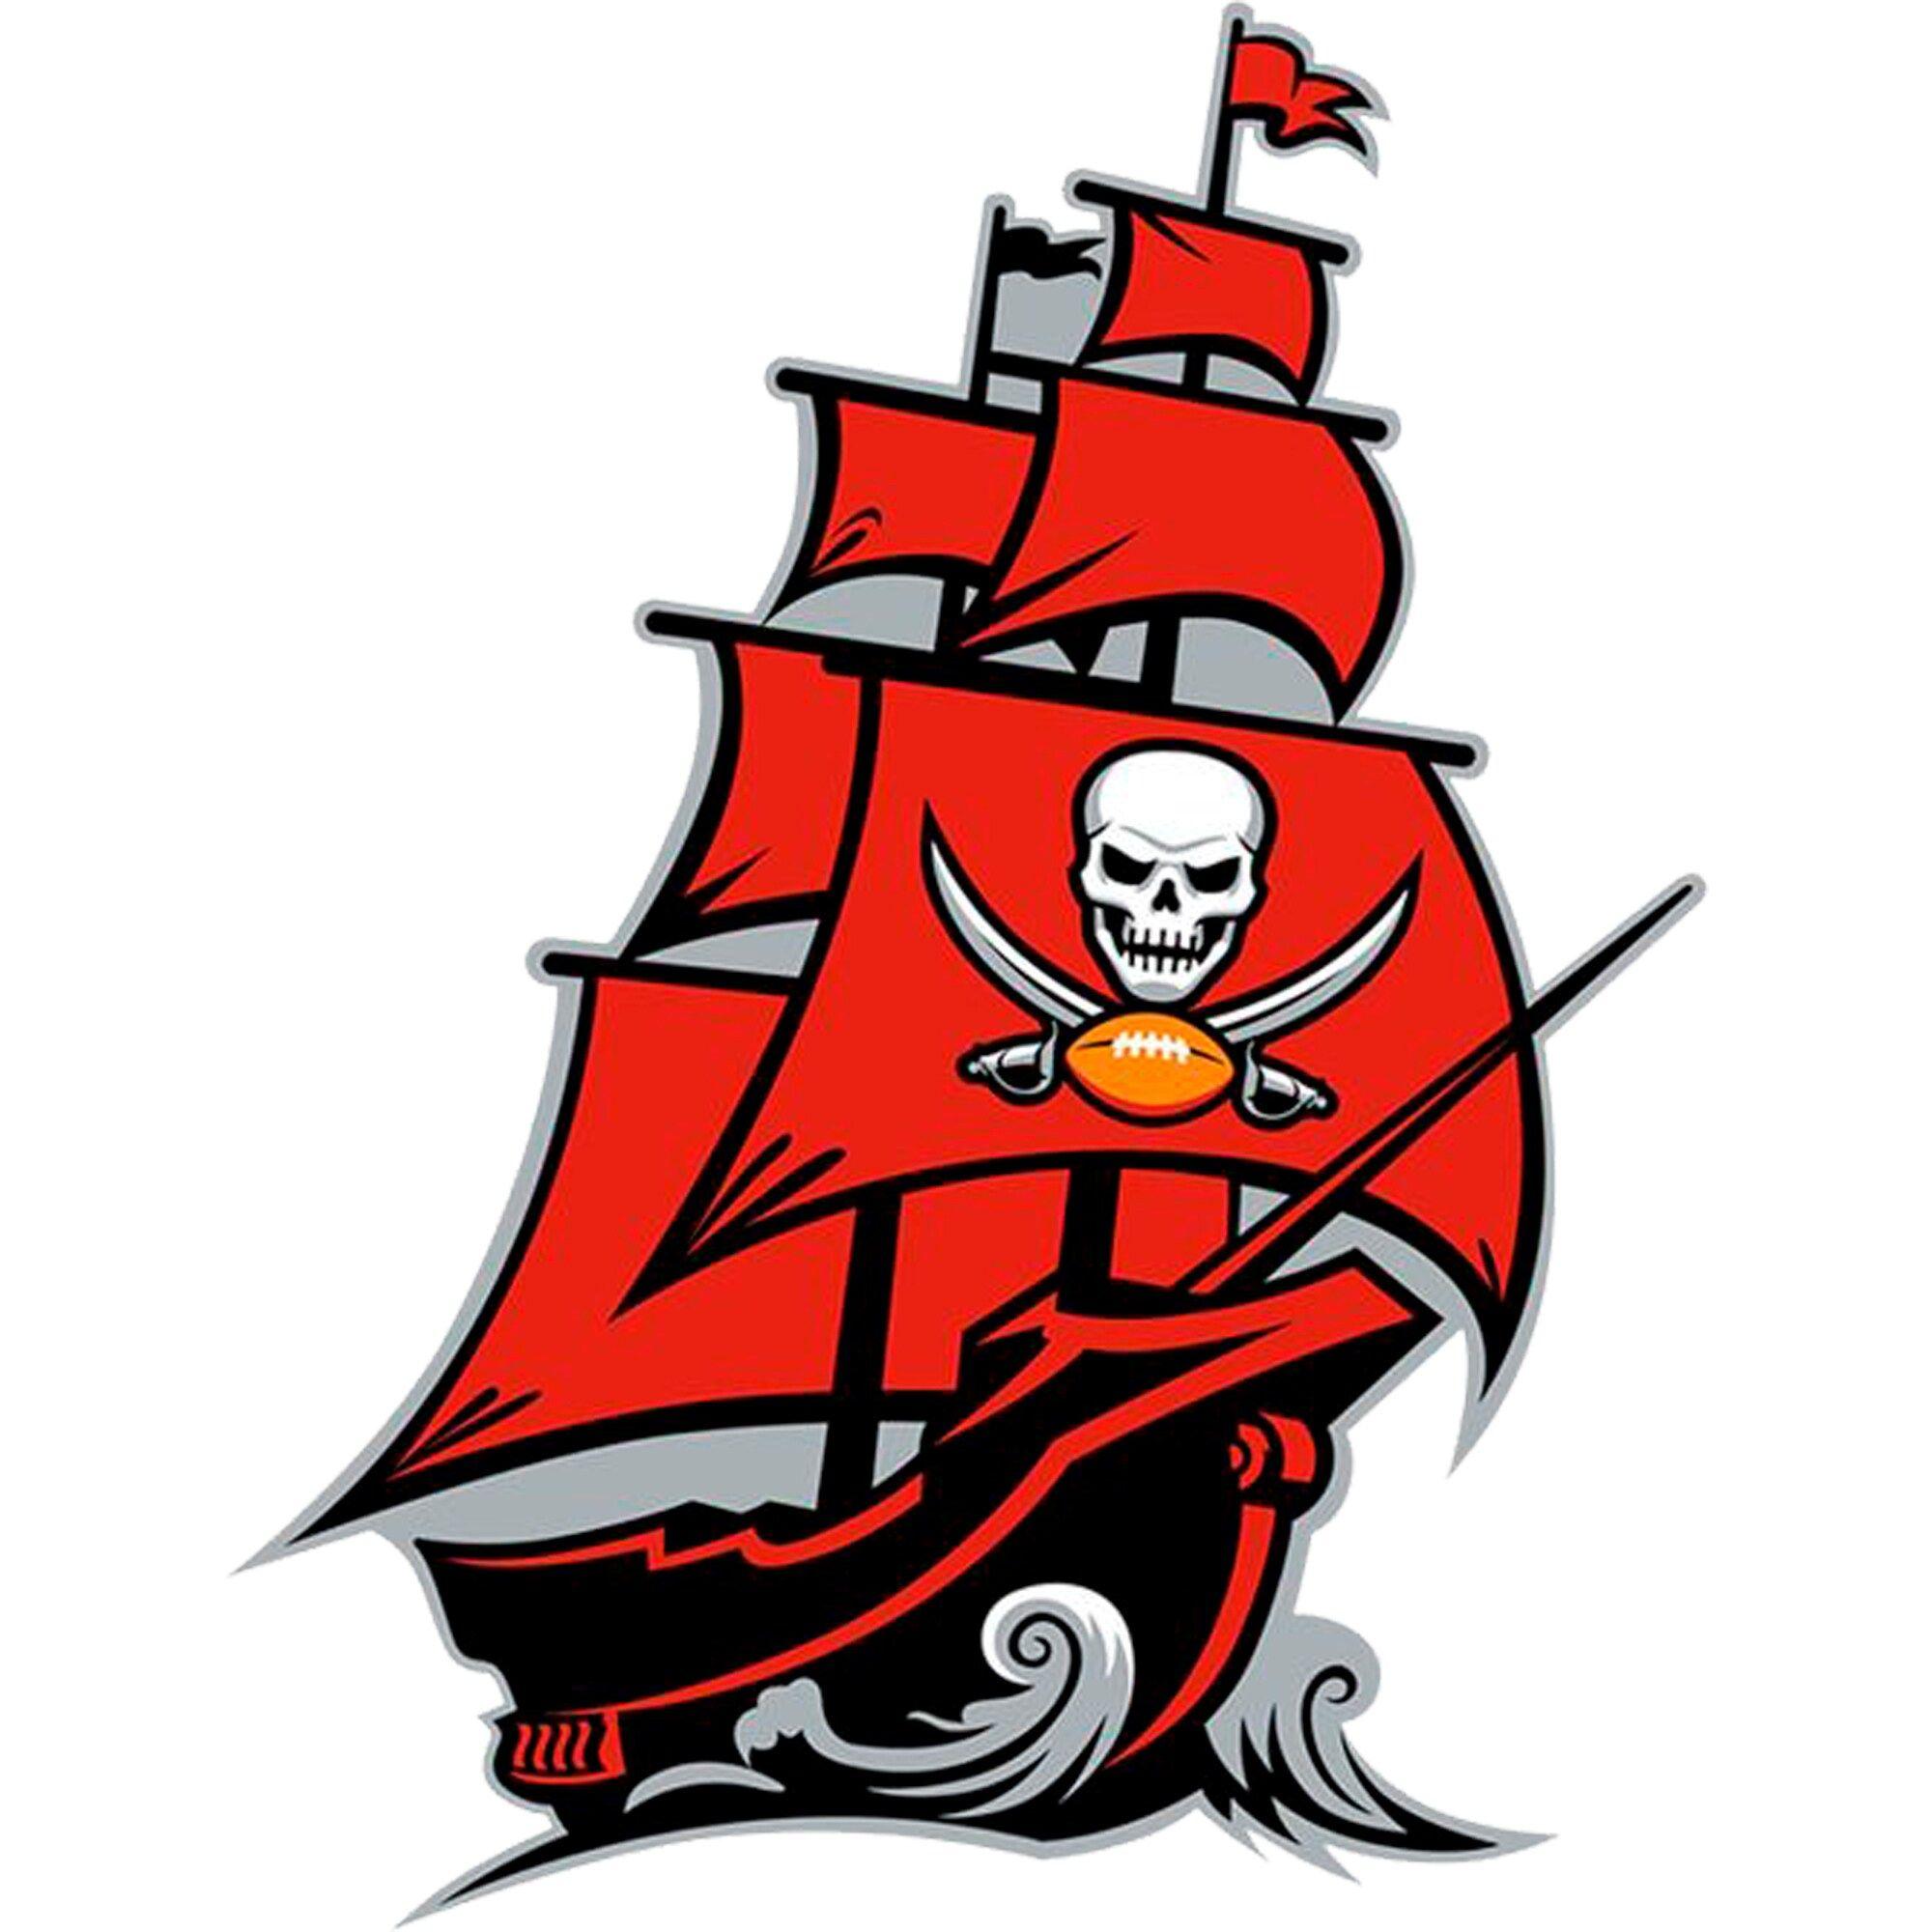 Tampa Bay Buccaneers Fathead Pirate Ship Giant Removable Decal In 2020 Tampa Bay Buccaneers Cheerleaders Tampa Bay Buccaneers Logo Tampa Bay Buccaneers